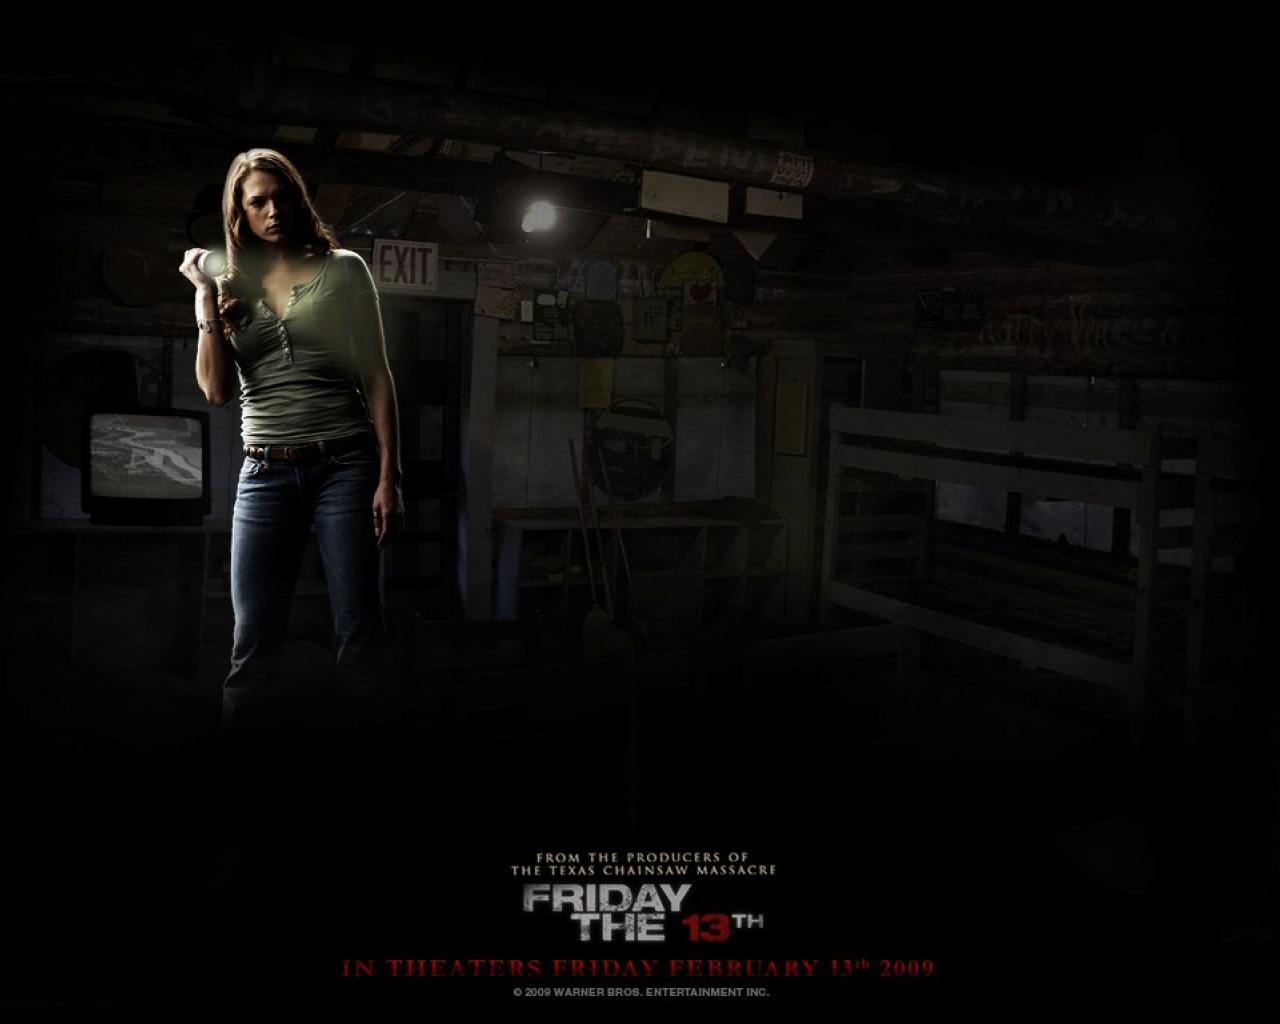 Free Download Friday The 13th Hd Wallpaper 27712 Hq Desktop